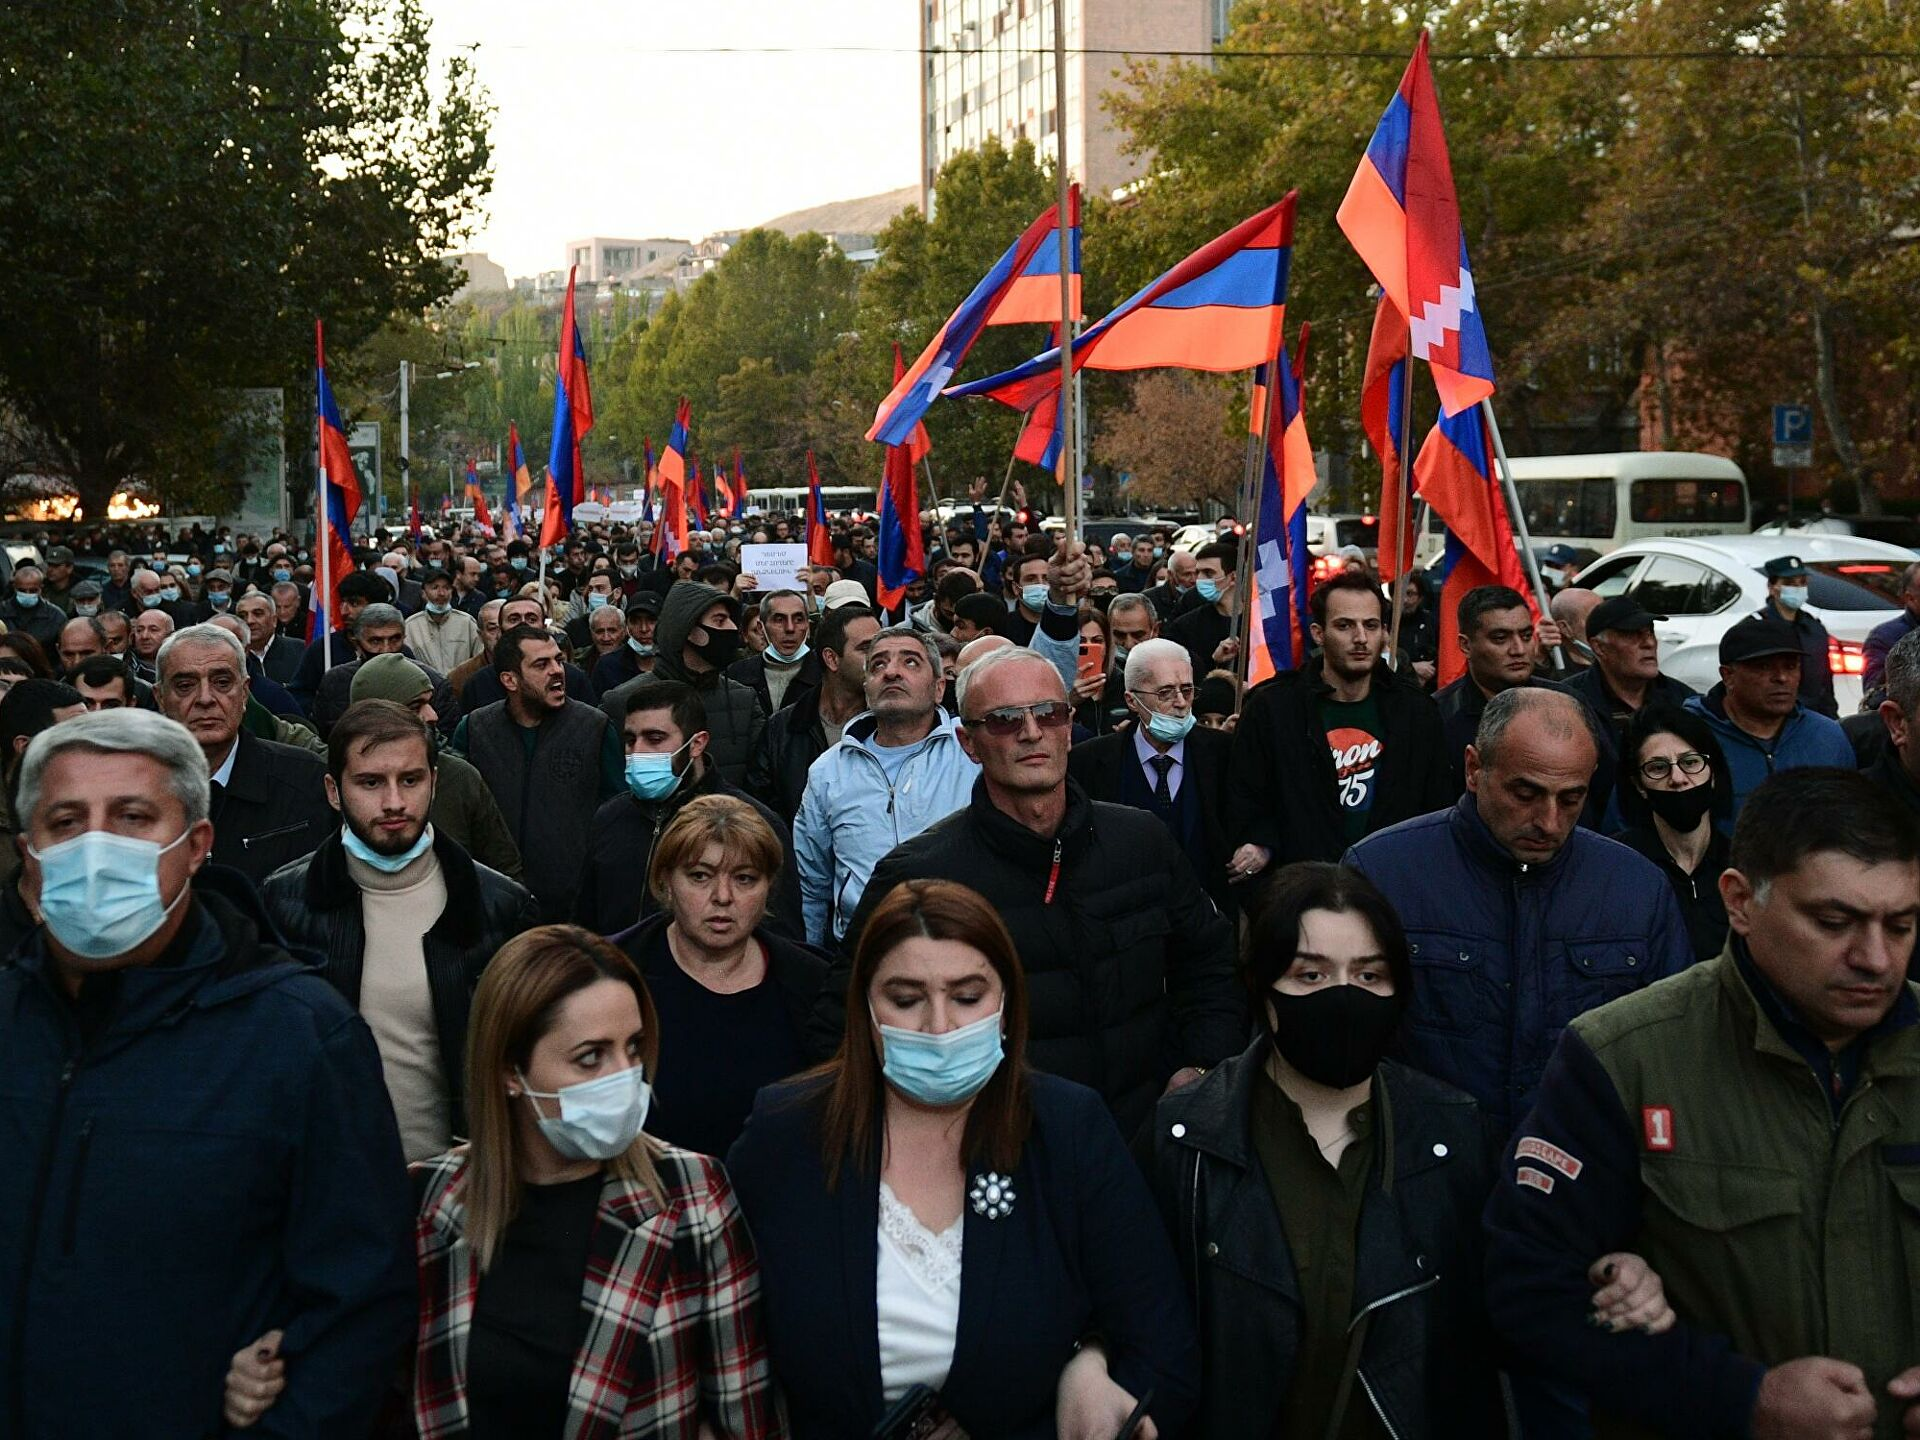 Митинг в Армении: сторонники экс-президента Кочаряна собрались у здания суда в Ереване